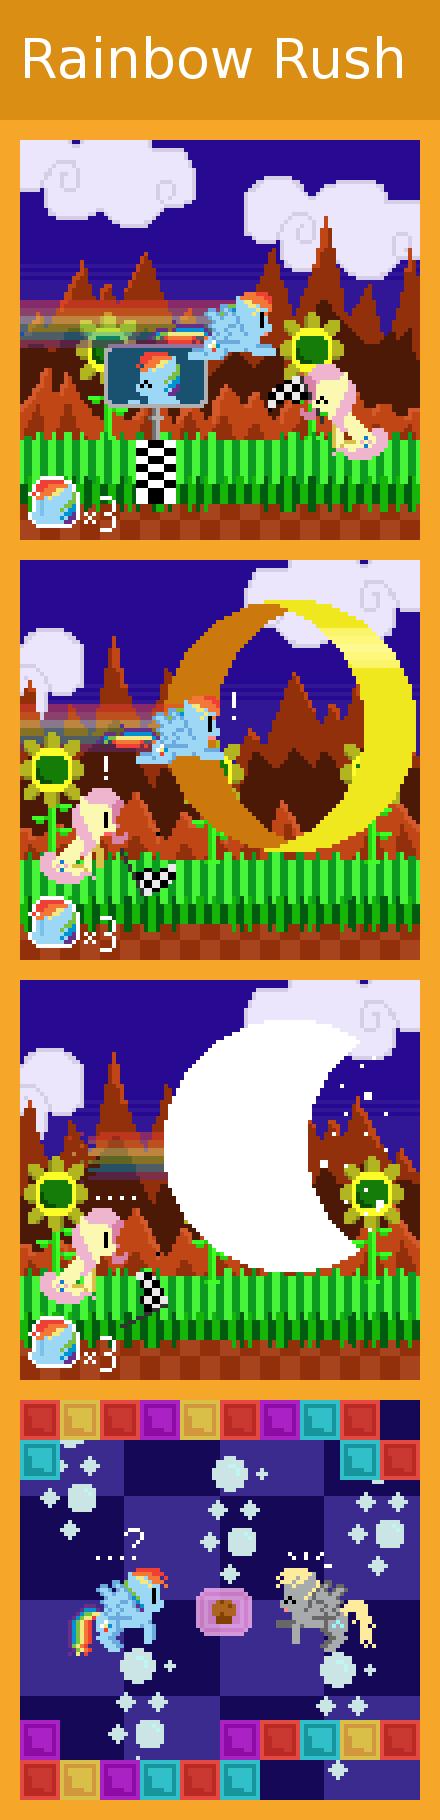 Rainbow Rush. via zztfox.deviantart.com/art/Rainbow-Rush-372890241?ga_submit_new=10%253A1369109980&ga_type=edit&ga_changes=1&ga_recent=1 Now Dash just needs to  My Little Pony retro pony pixel Rainbow dash Fluttershy Derpy Hooves Muffin Sonic sega